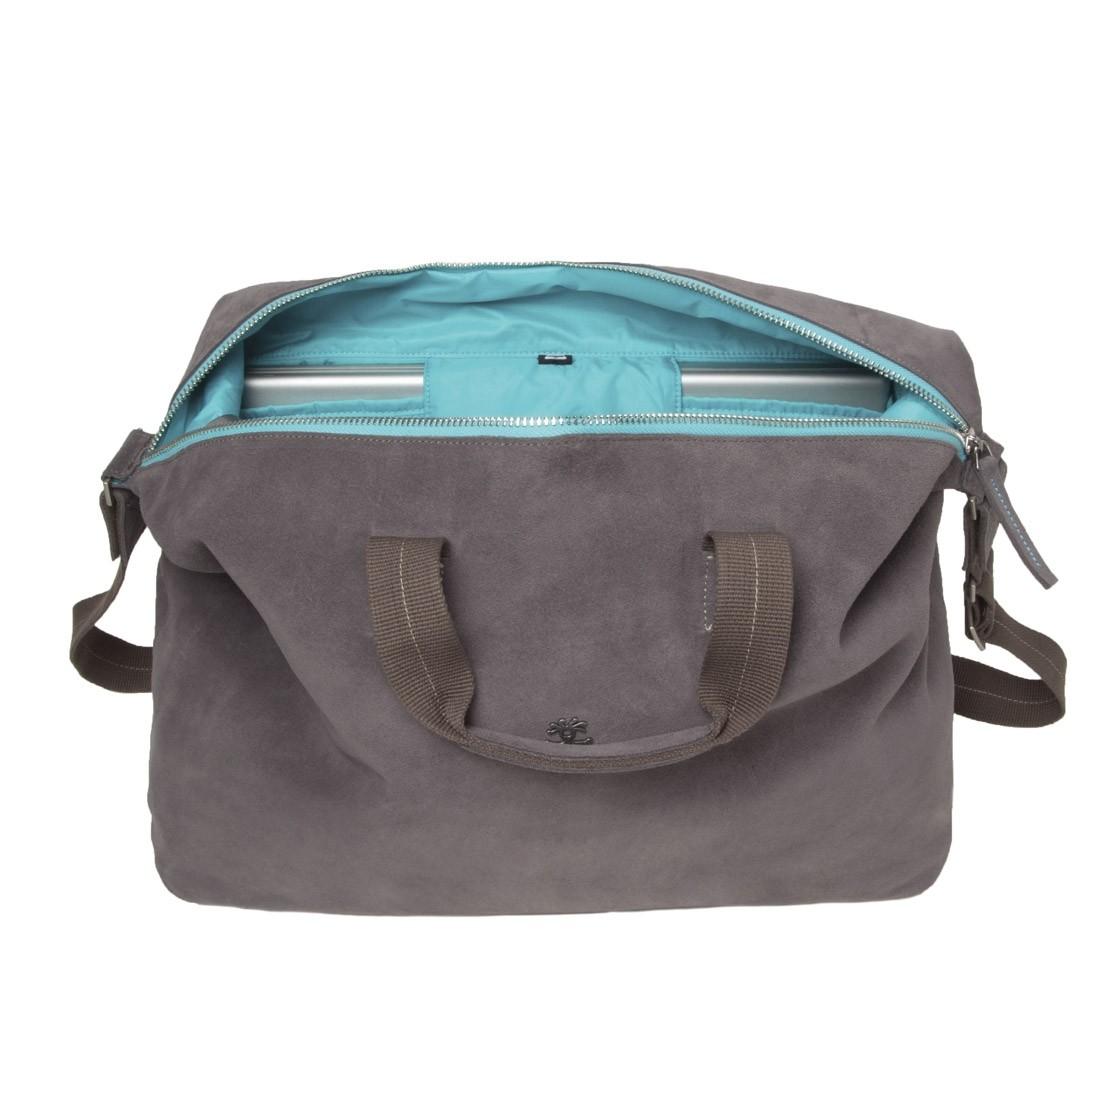 d3c047b12d Cestovní taška Crumpler Bavarian Boomer Weekender grey green